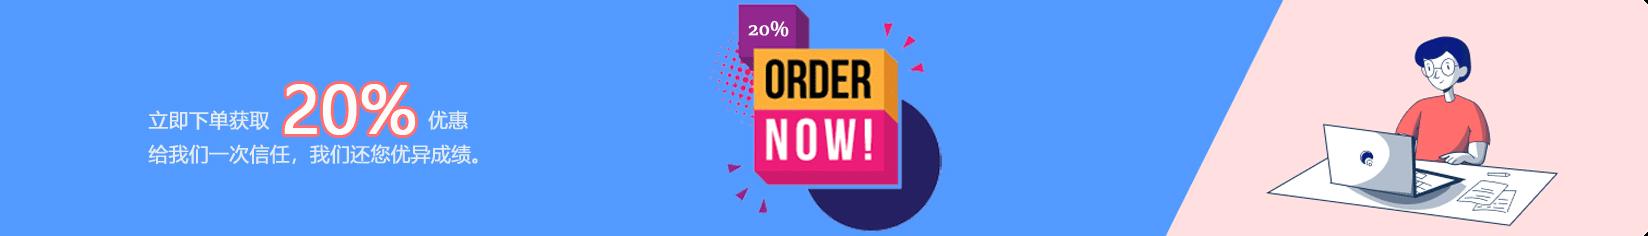 https://paperdaixie.com/order/orders/stud/new